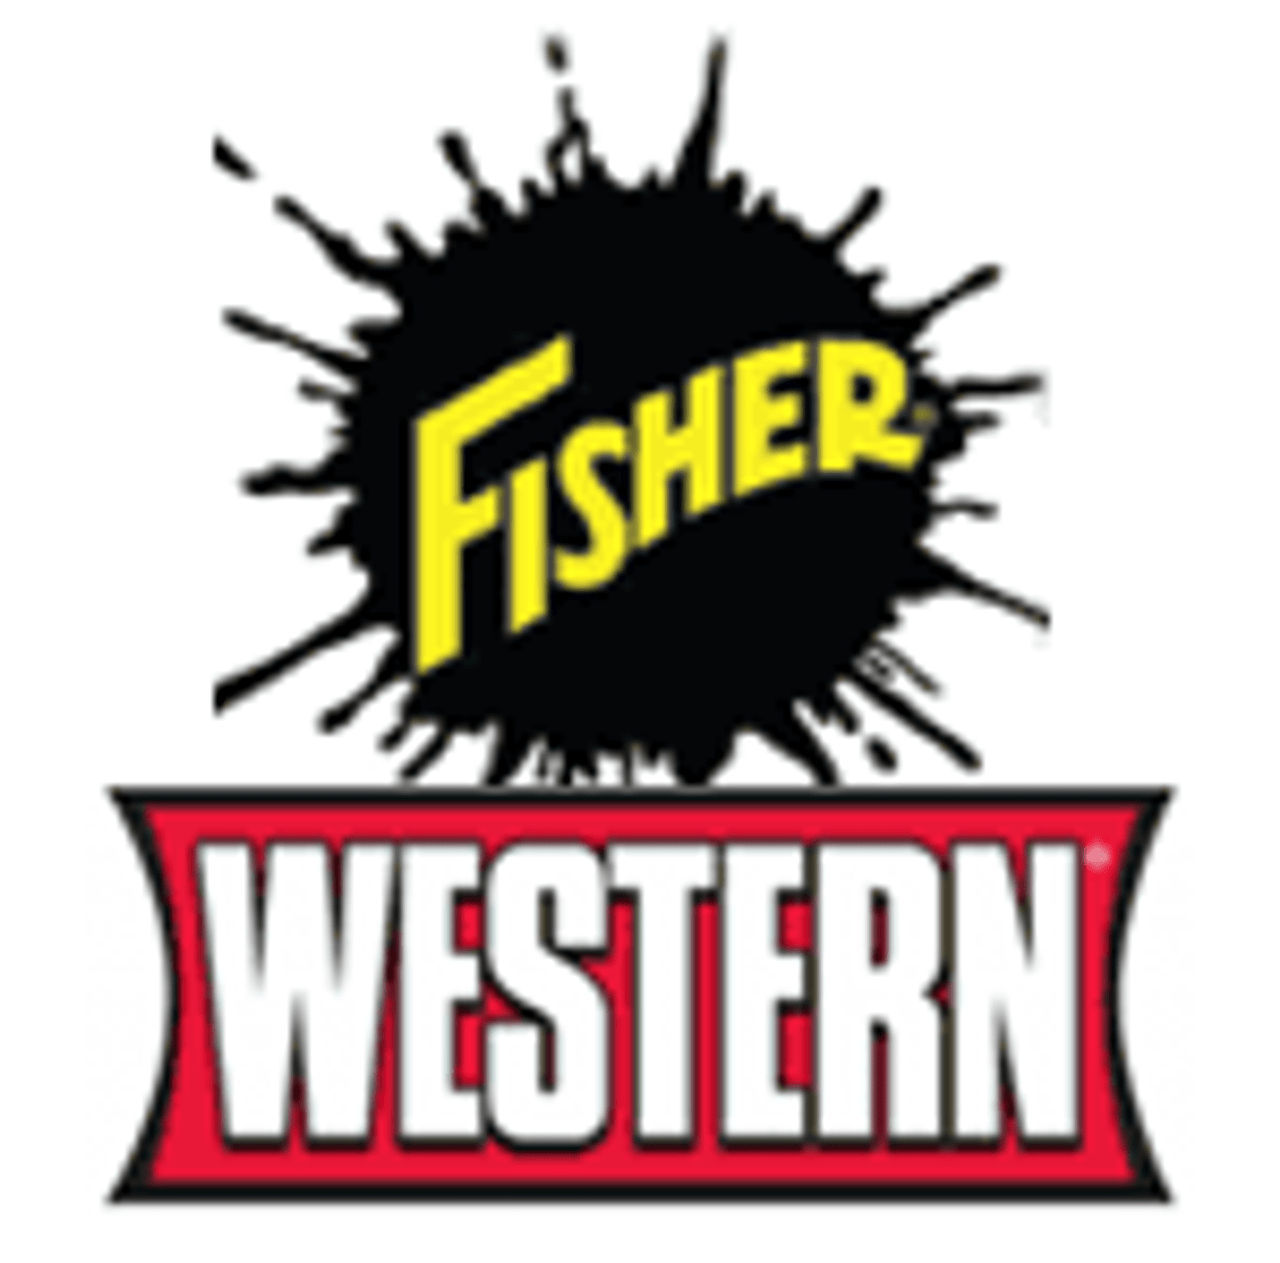 99494 FISHER GENUINE SPREADER ACCESSORY - STEEL-CASTER -  STROBE LIGHT KIT - (ELECTRIC)